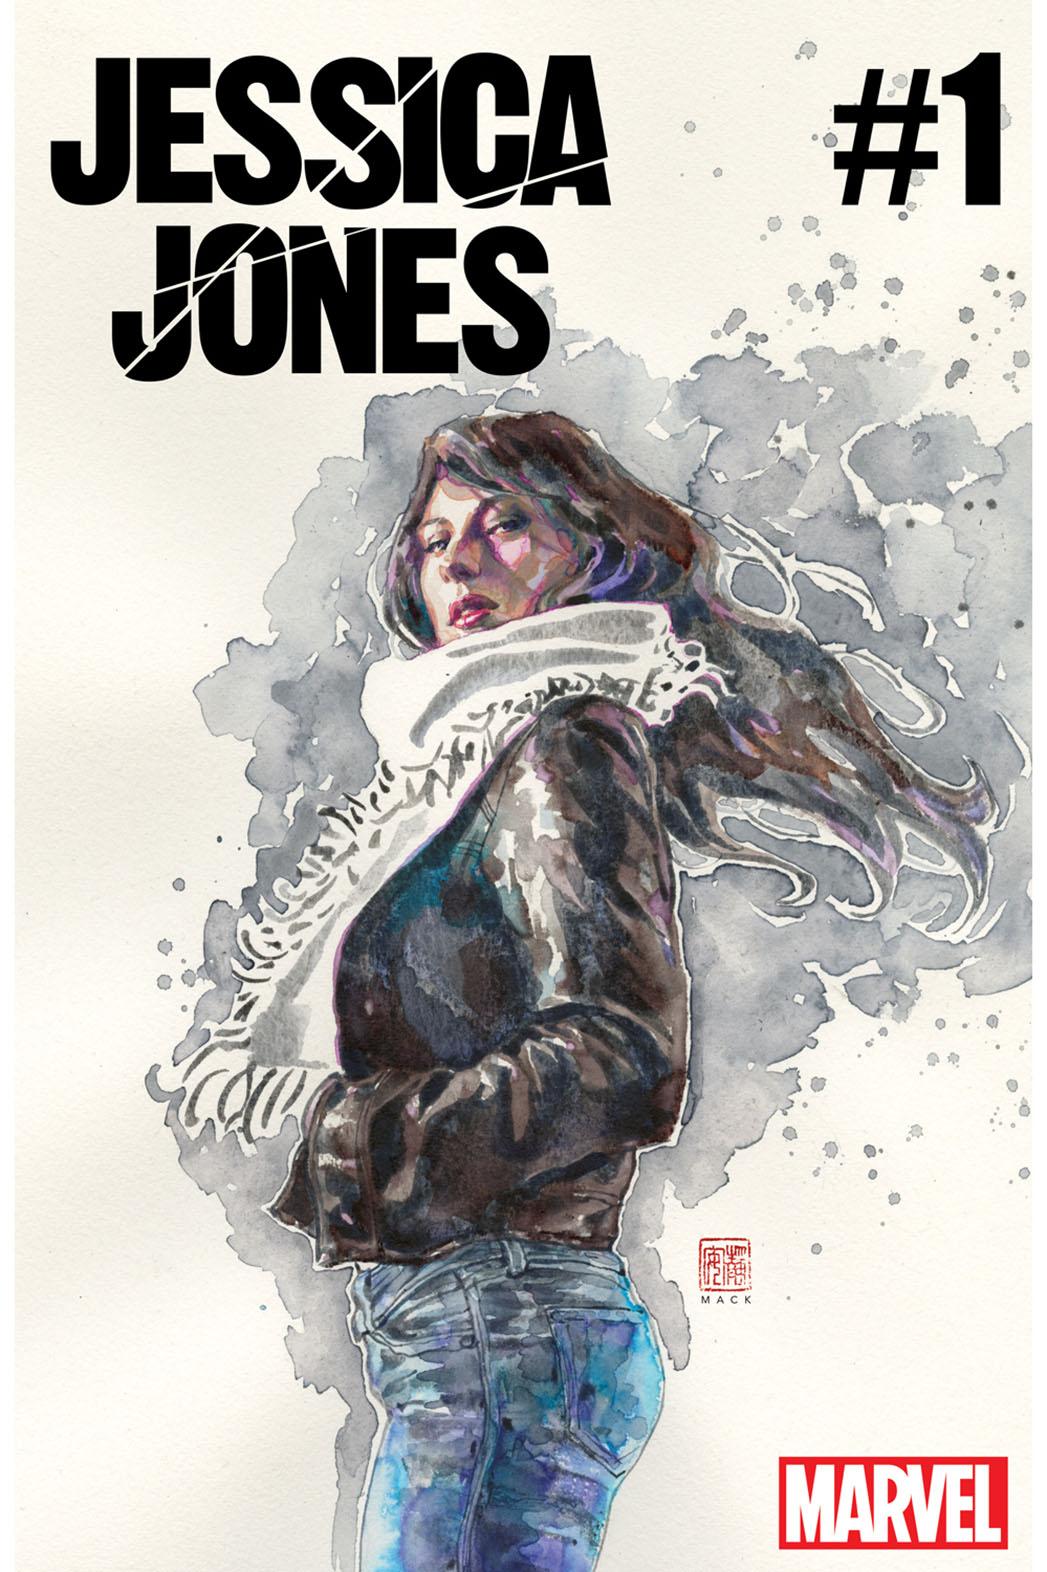 Jessica Jones #1 Cover - Publicity - P 2016